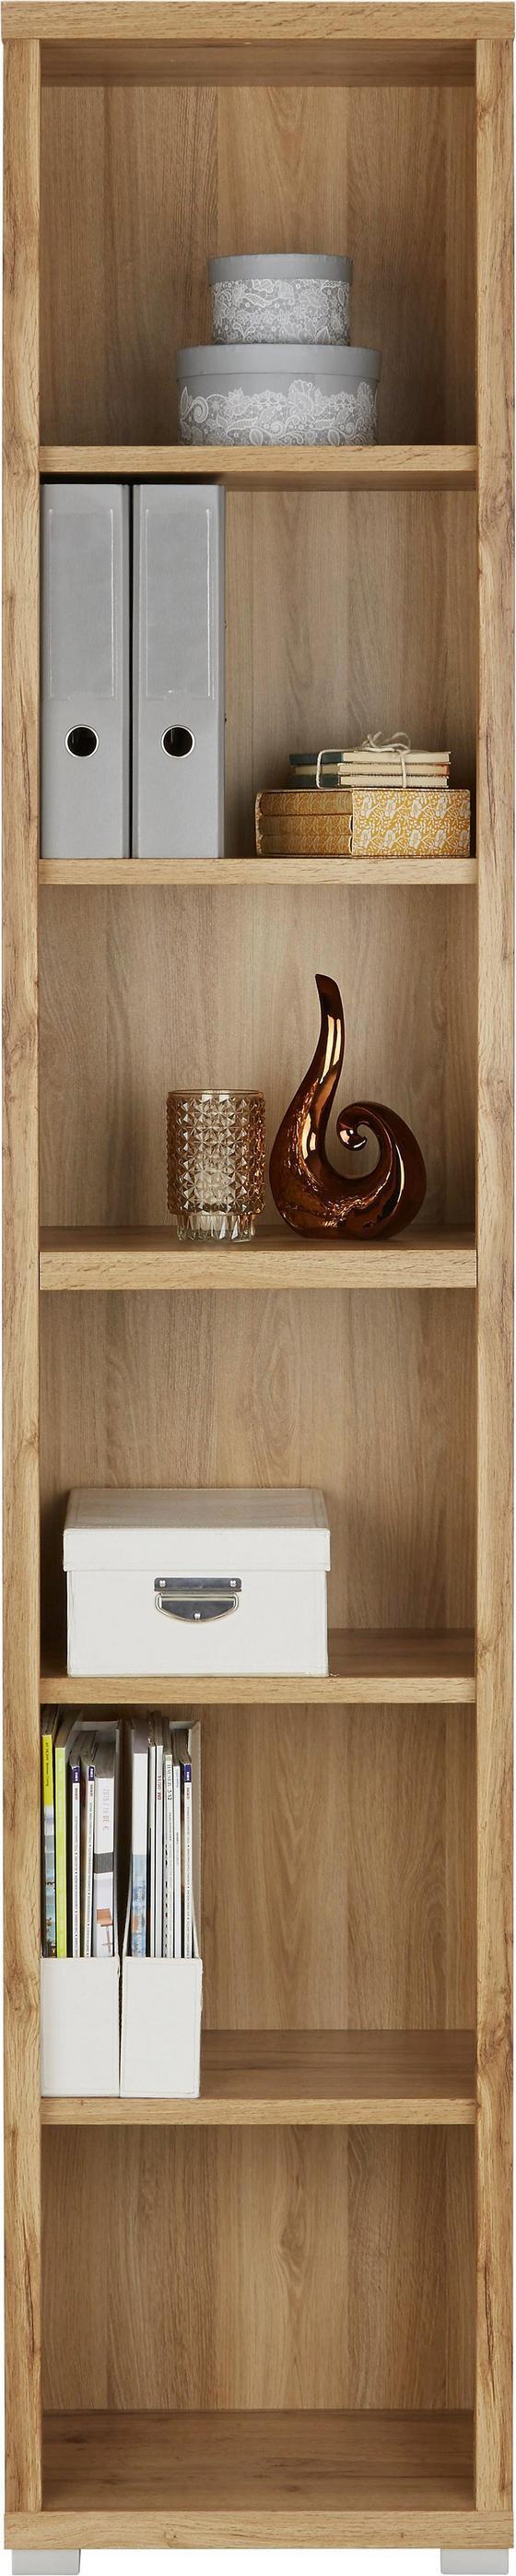 Regál Line4 10d4rr02 - bílá/barvy dubu, Moderní, dřevěný materiál (44/218/36cm)